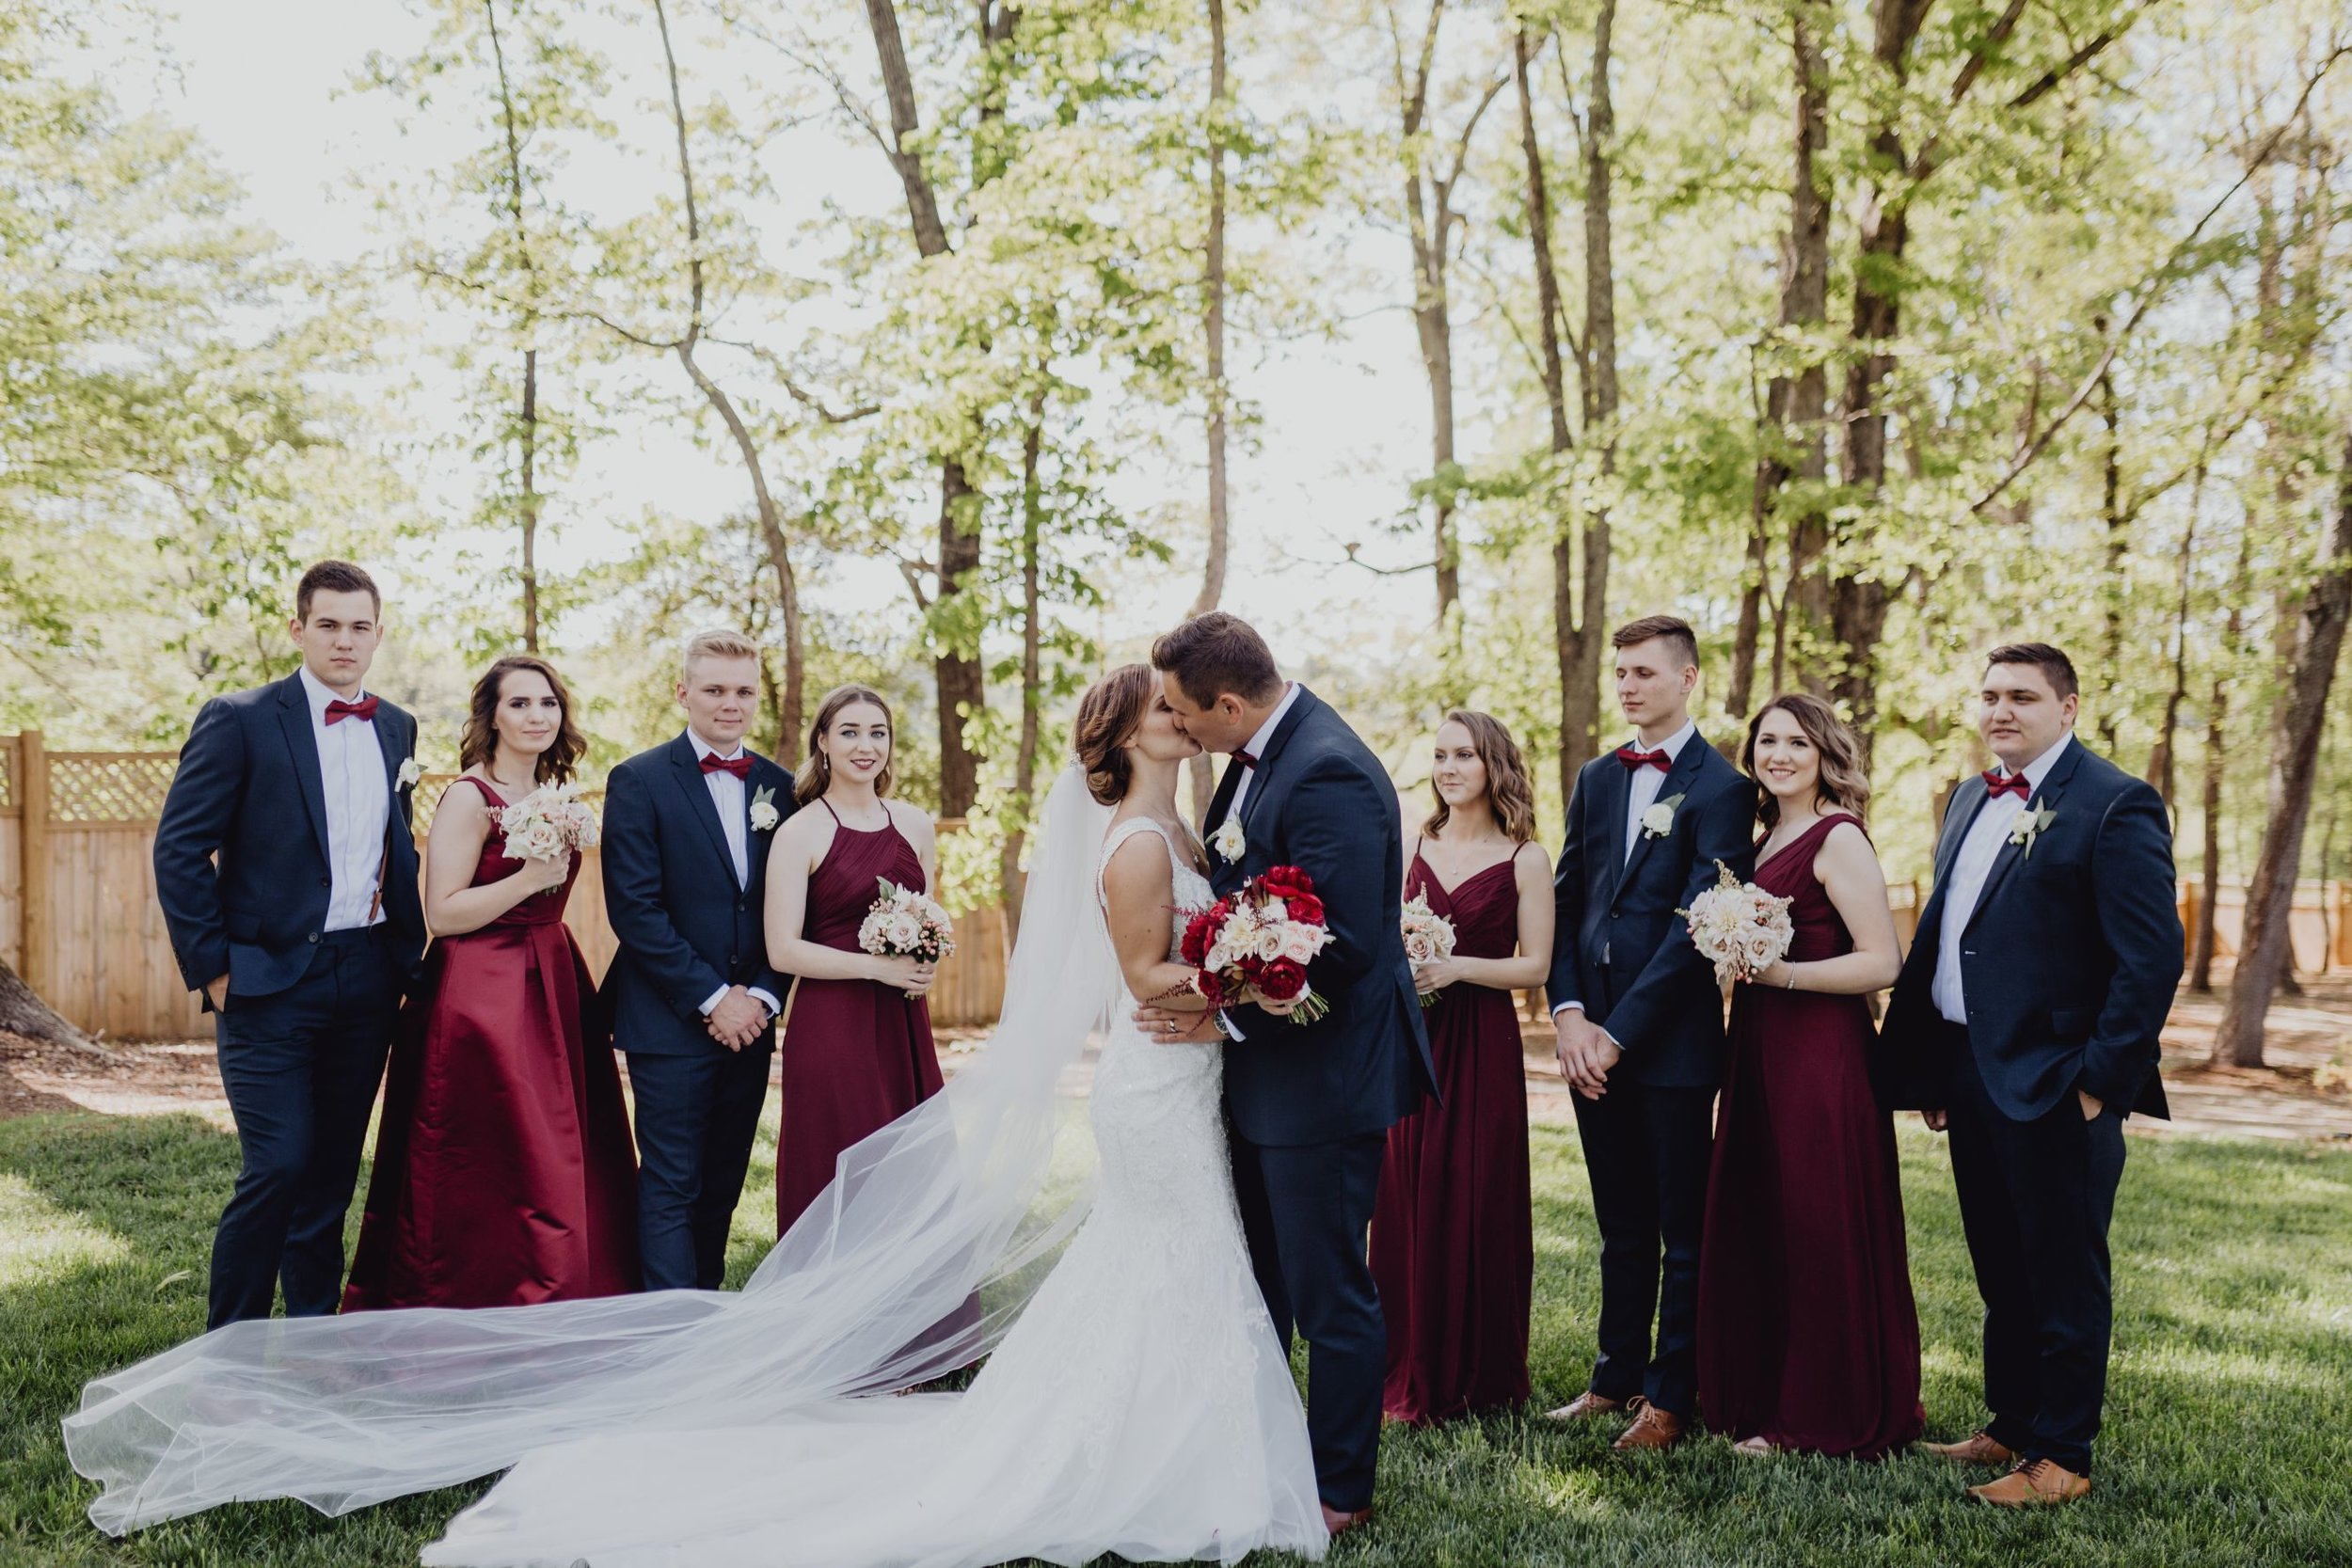 North-Dallas-Wedding-Florist-David-Co.-9.jpg